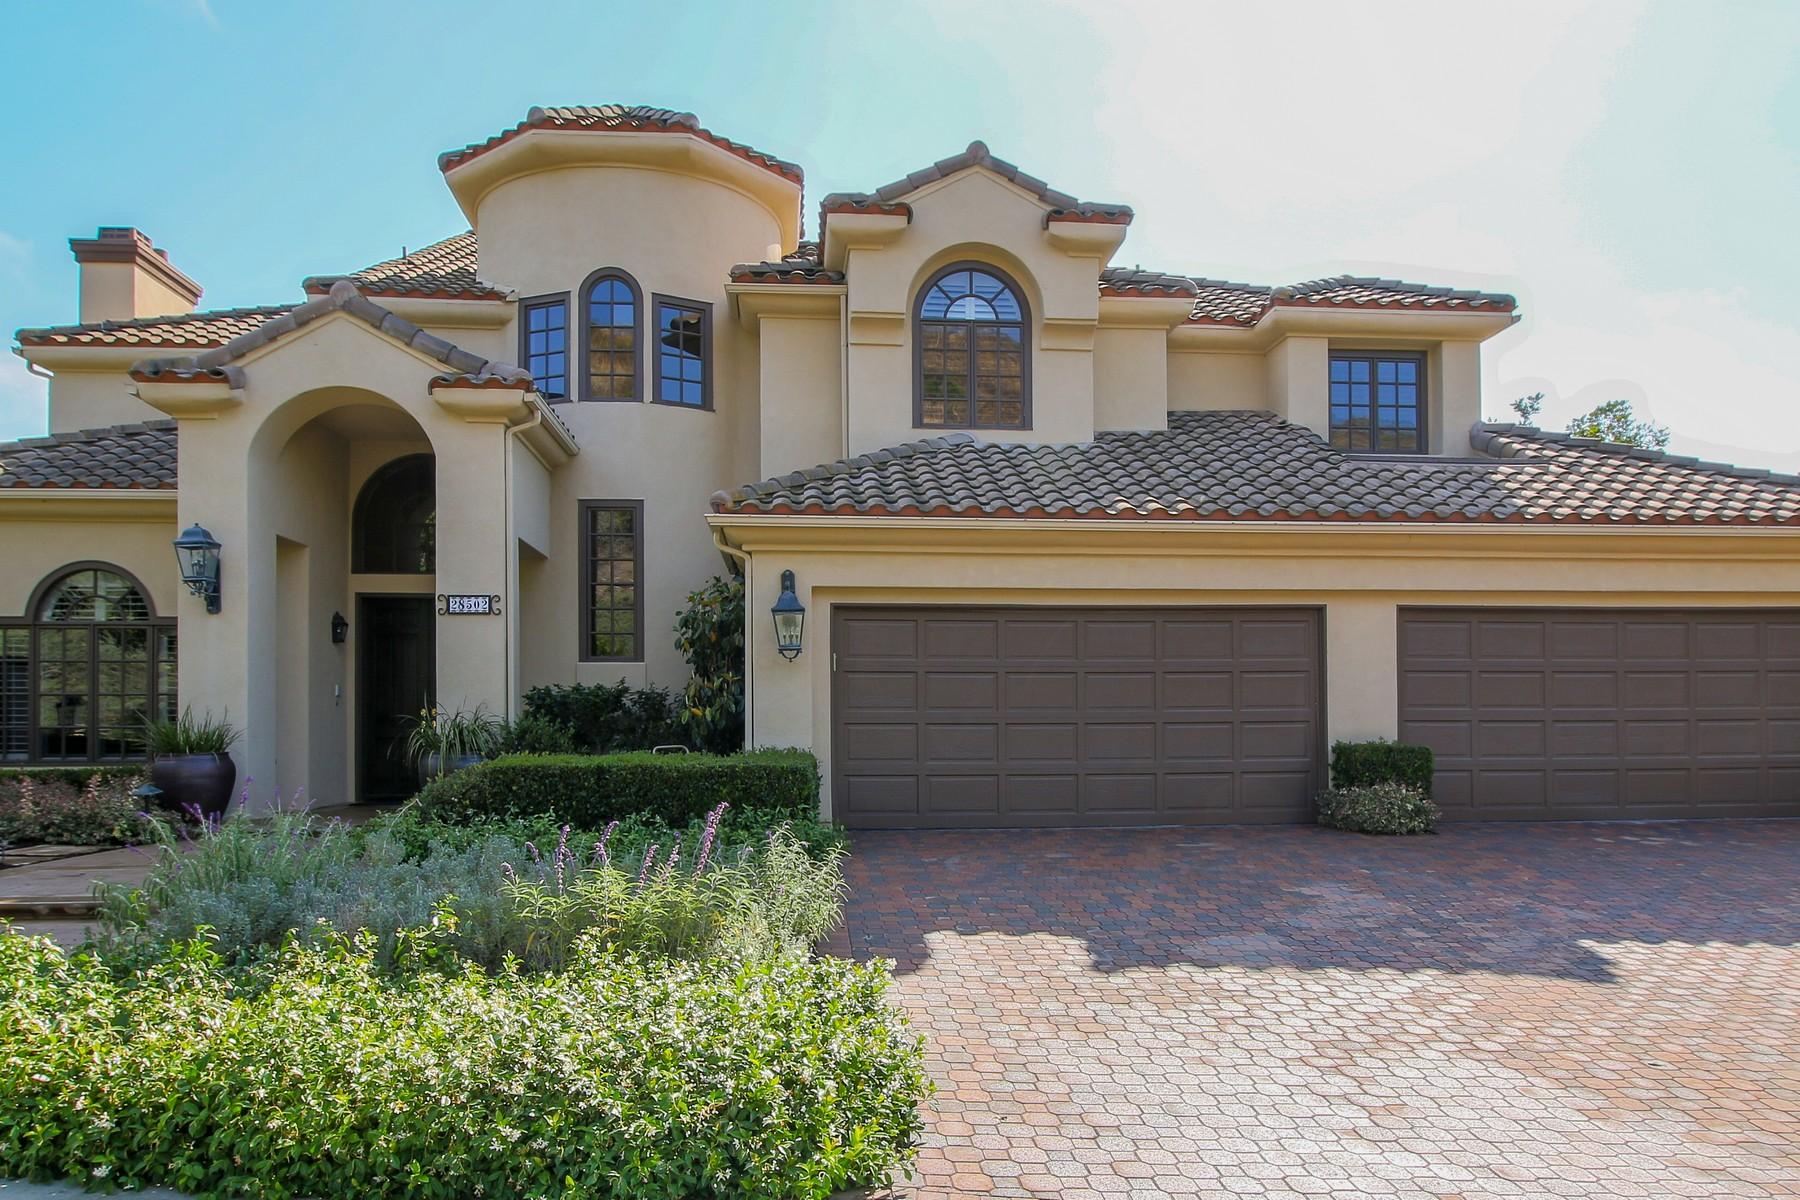 Single Family Home for Sale at 28502 Calle Pinon San Juan Capistrano, California 92675 United States